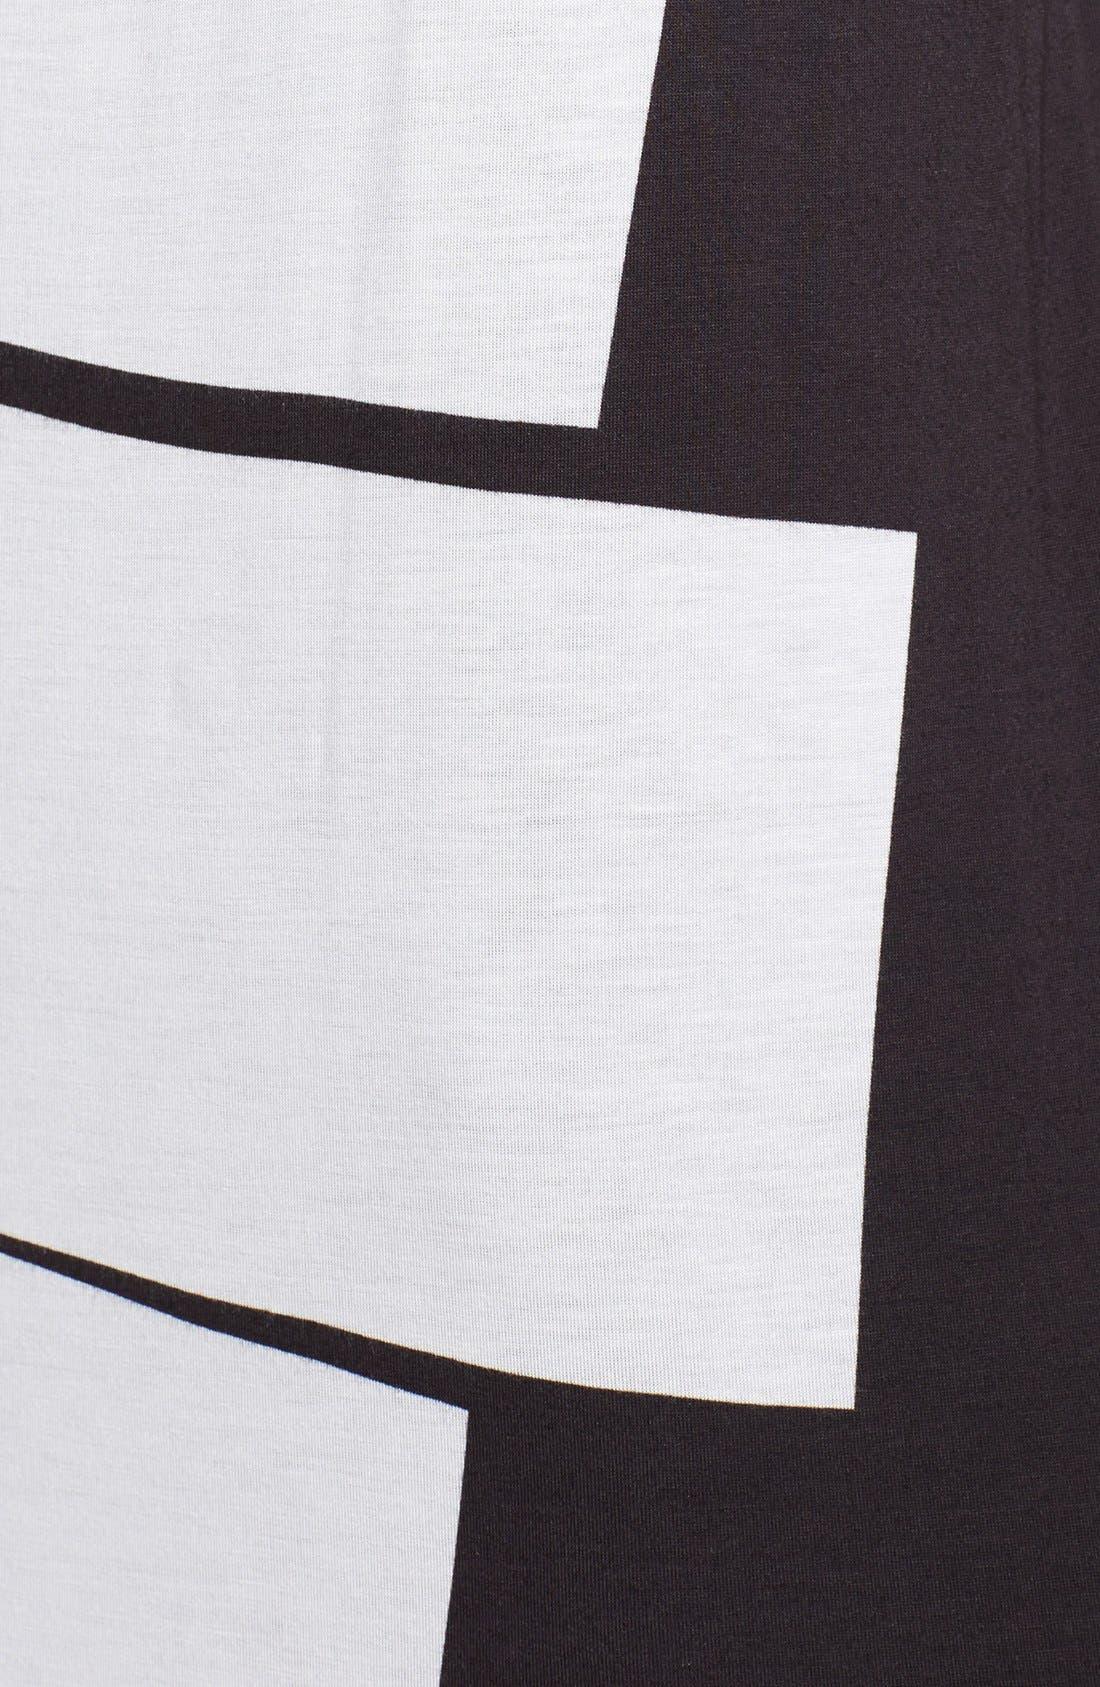 Alternate Image 3  - Helmut Lang Lithograph Print Jersey Maxi Dress